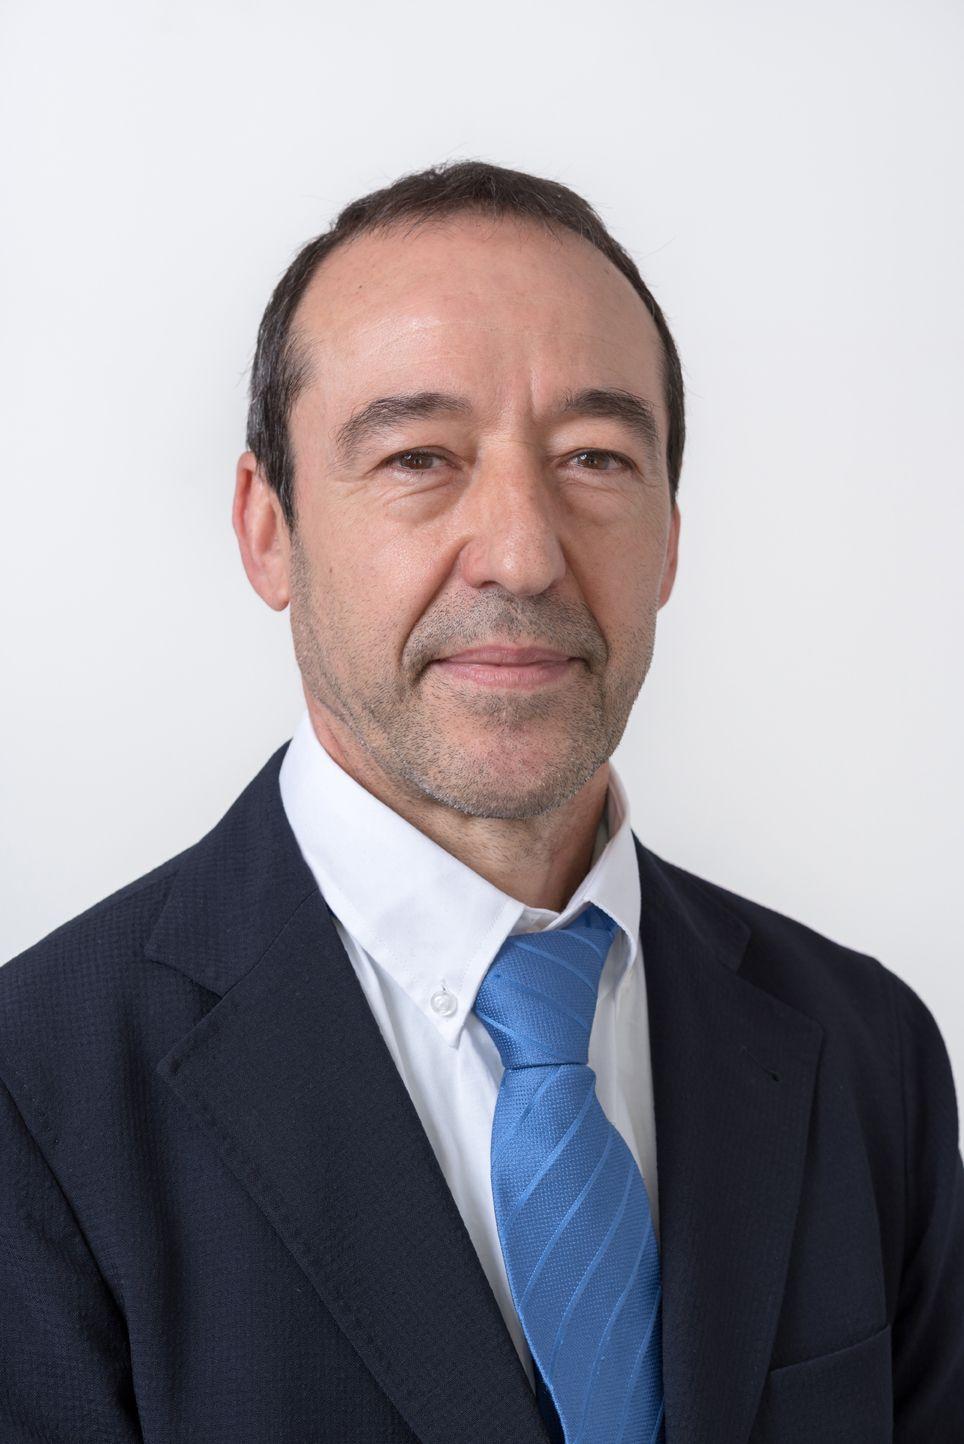 Manuel Holgado